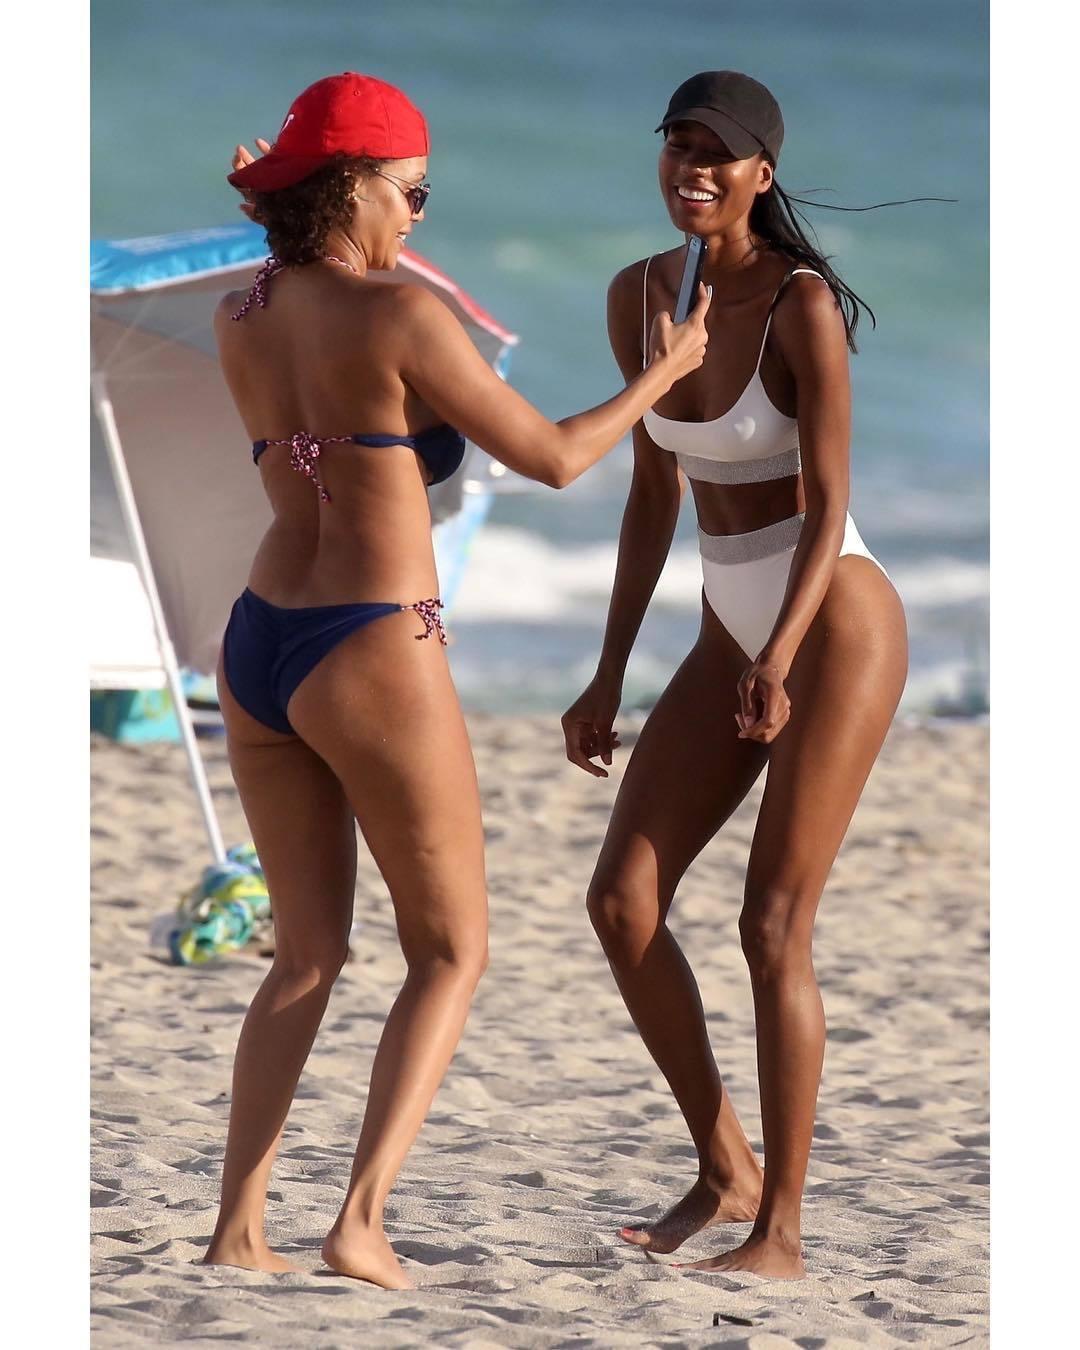 Video Jazzma Kendrick nudes (15 photos), Sexy, Is a cute, Twitter, underwear 2019